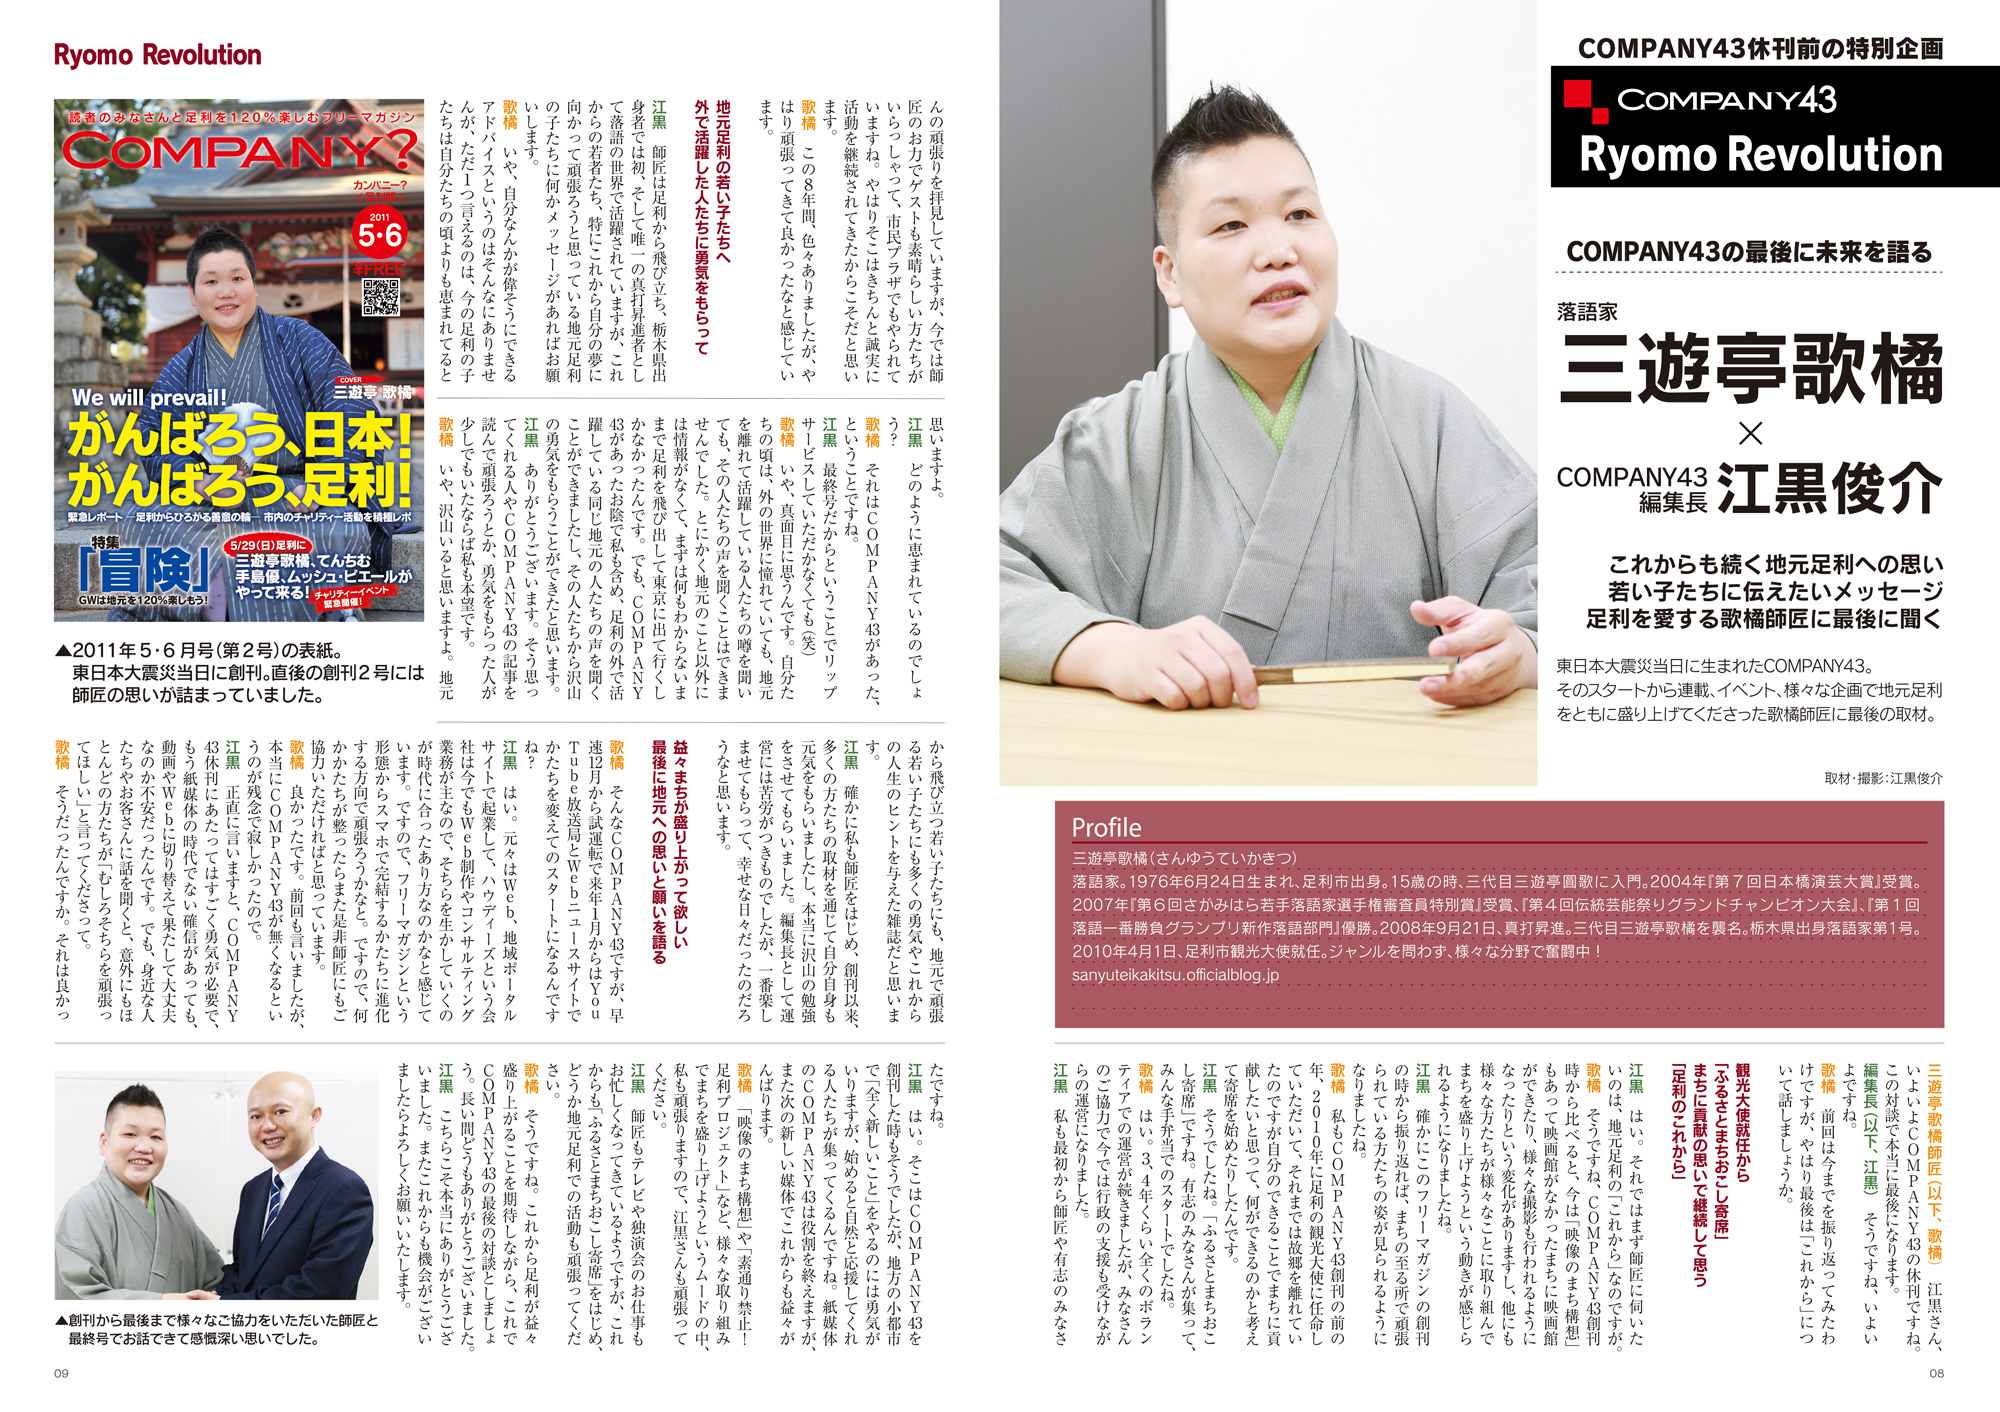 COMPANY43休刊前の特別企画 Ryomo Revolution -後編-